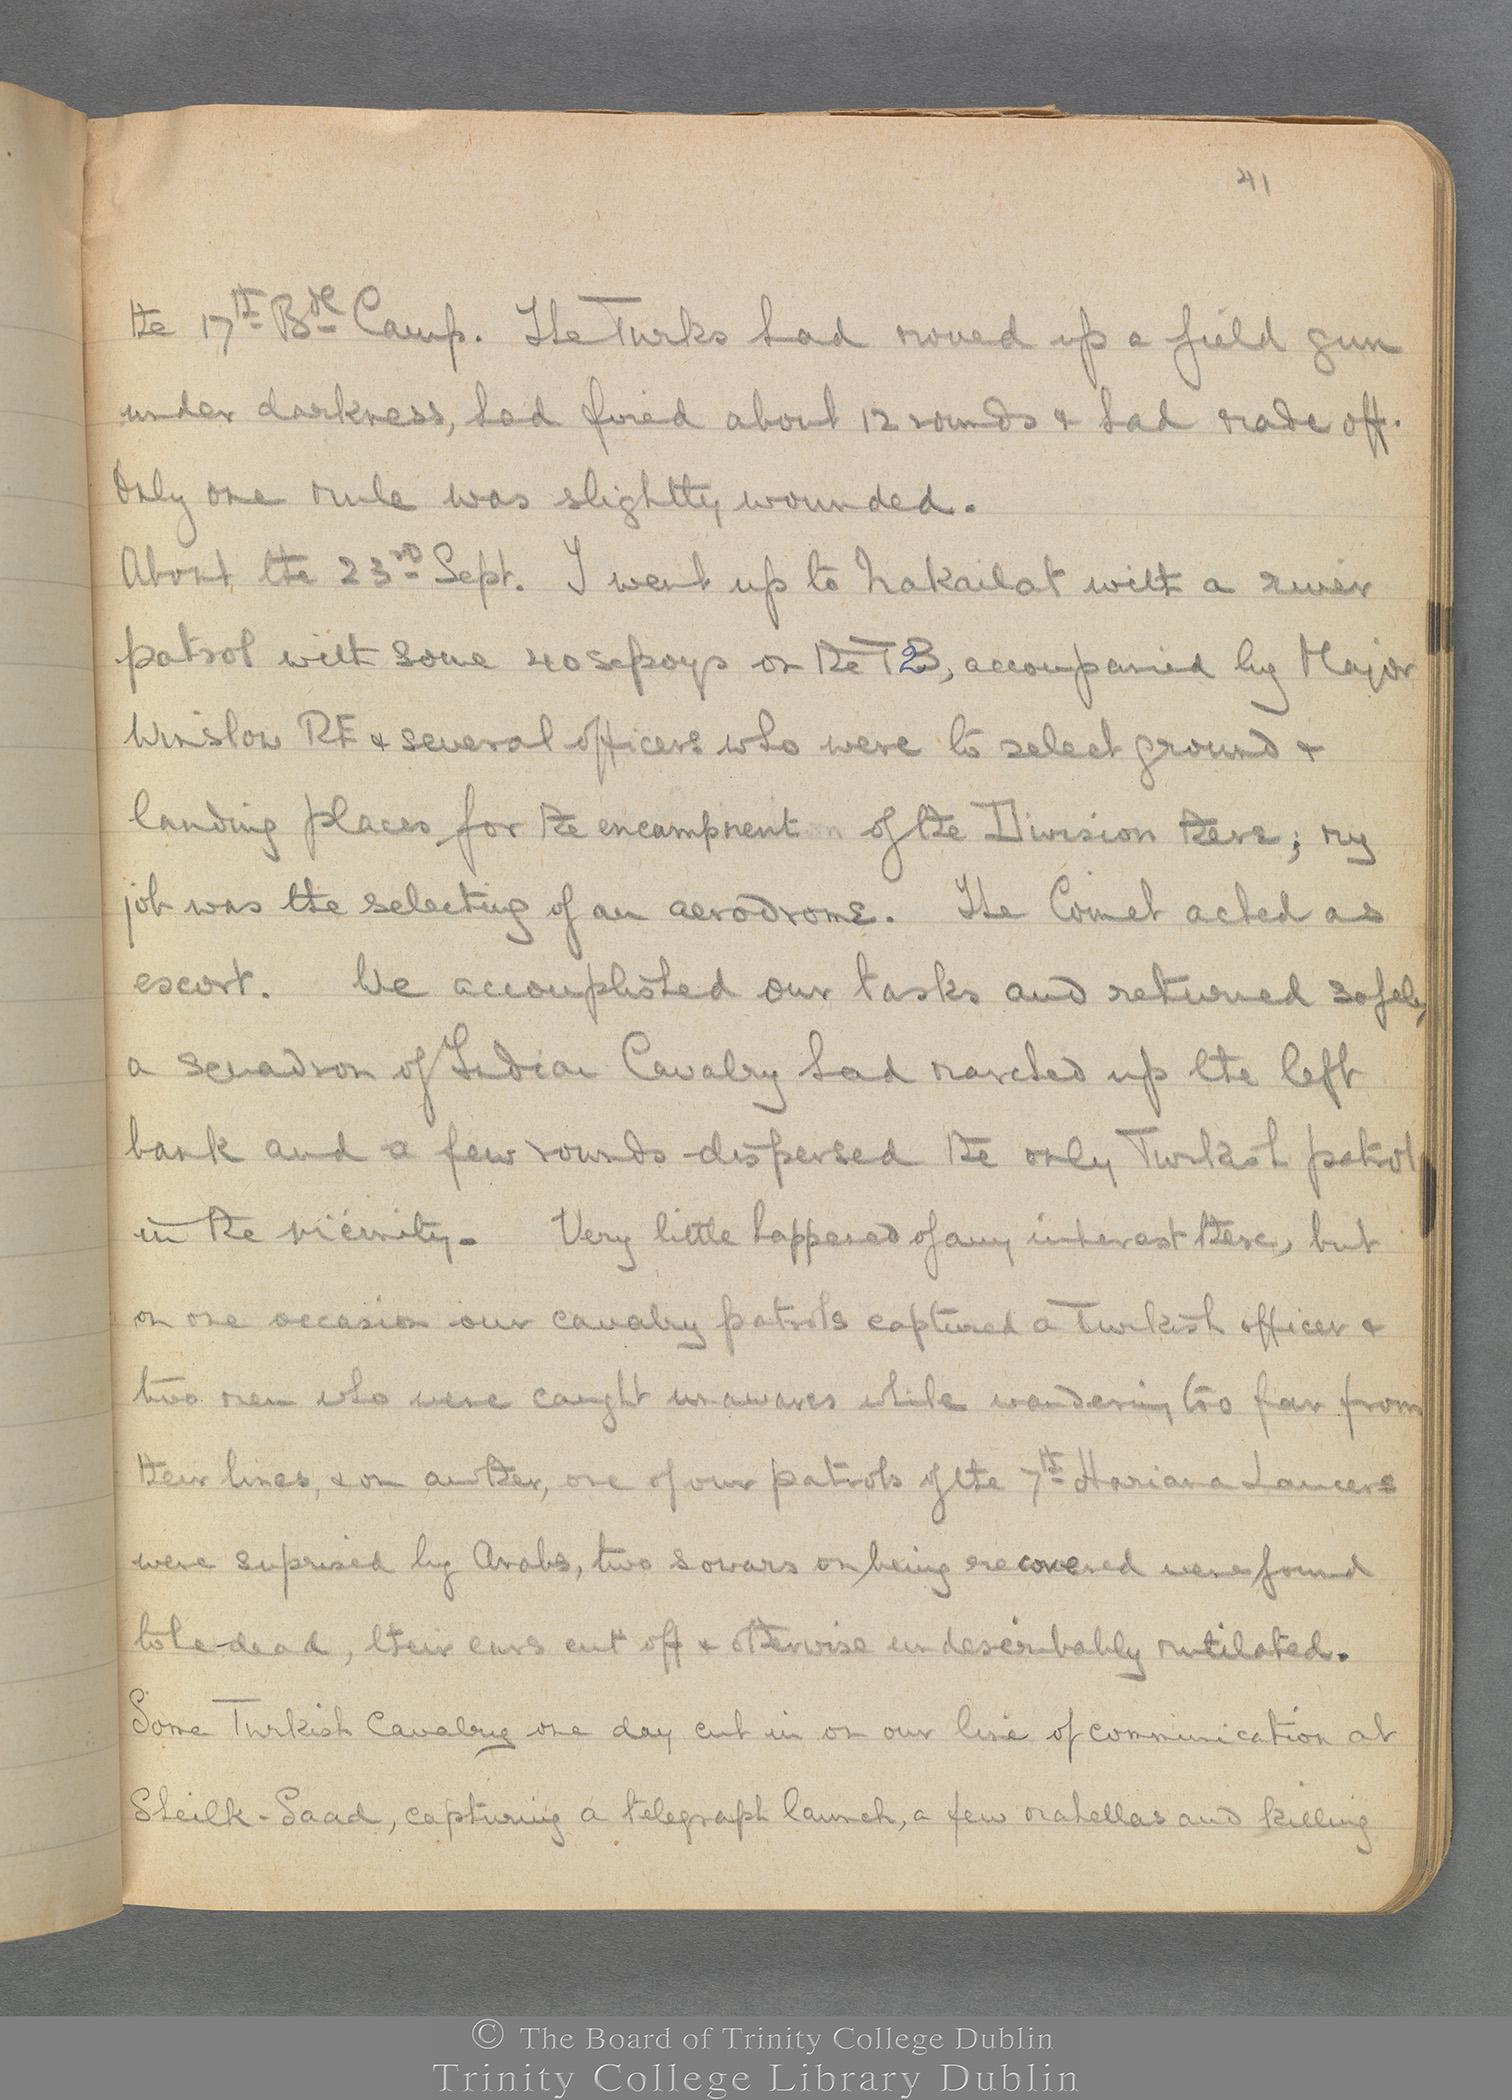 TCD MS 3414 folio 41 recto